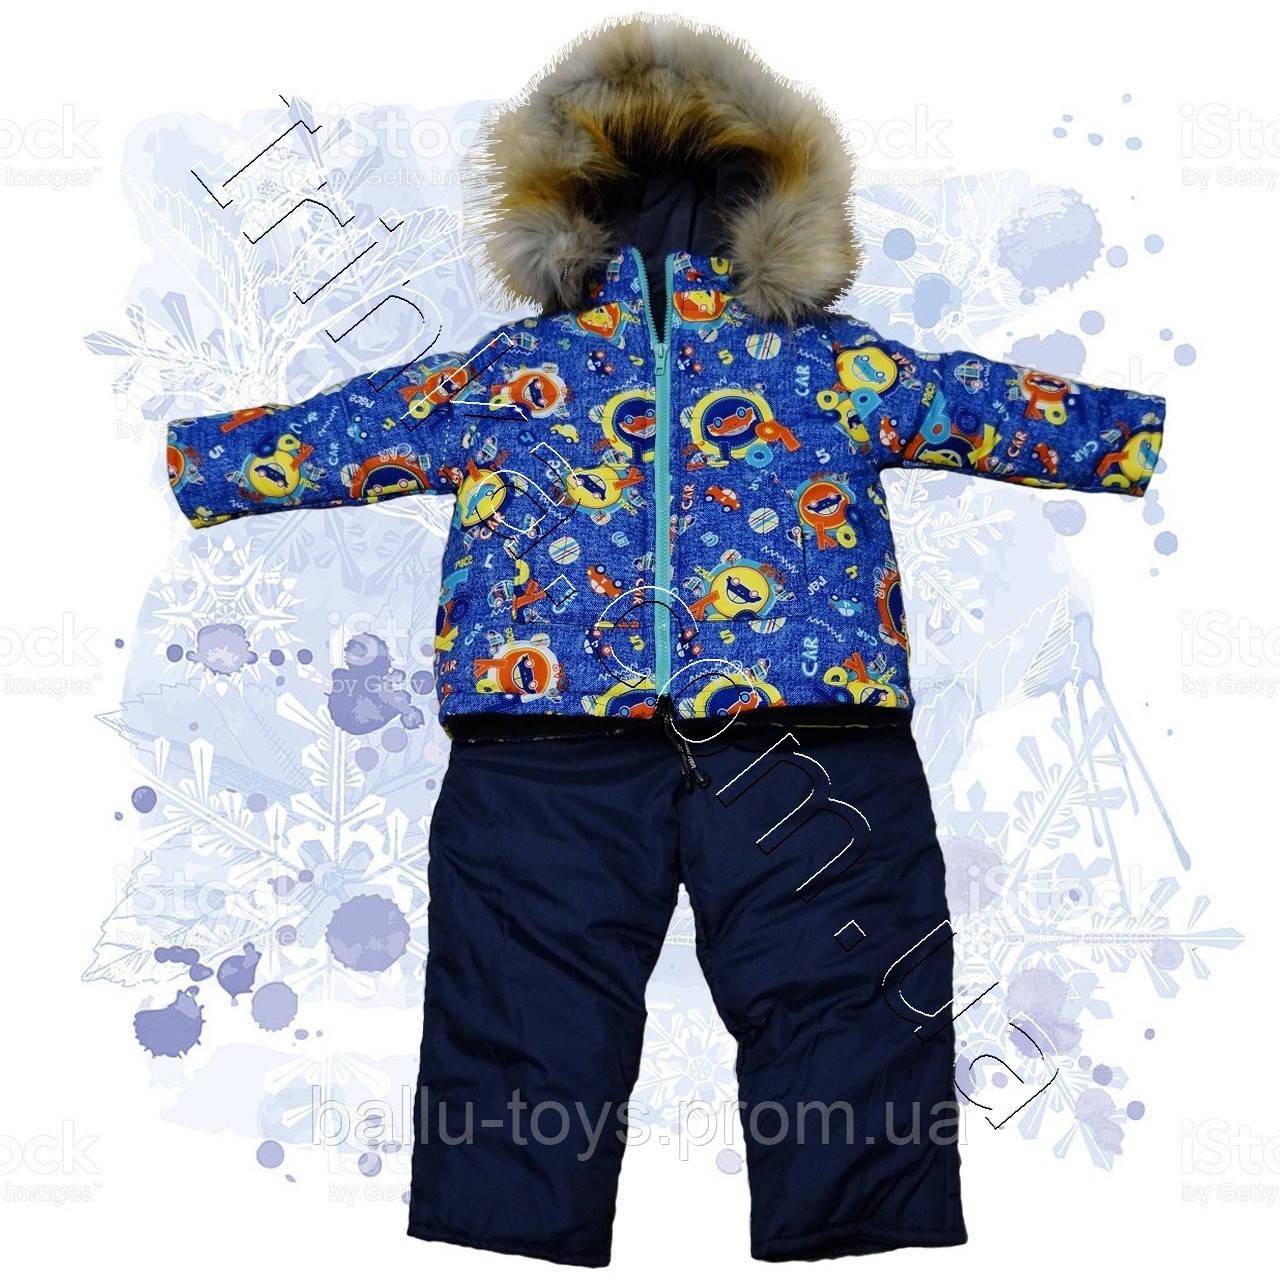 Зимний костюм для мальчика Boy (2-5 лет)